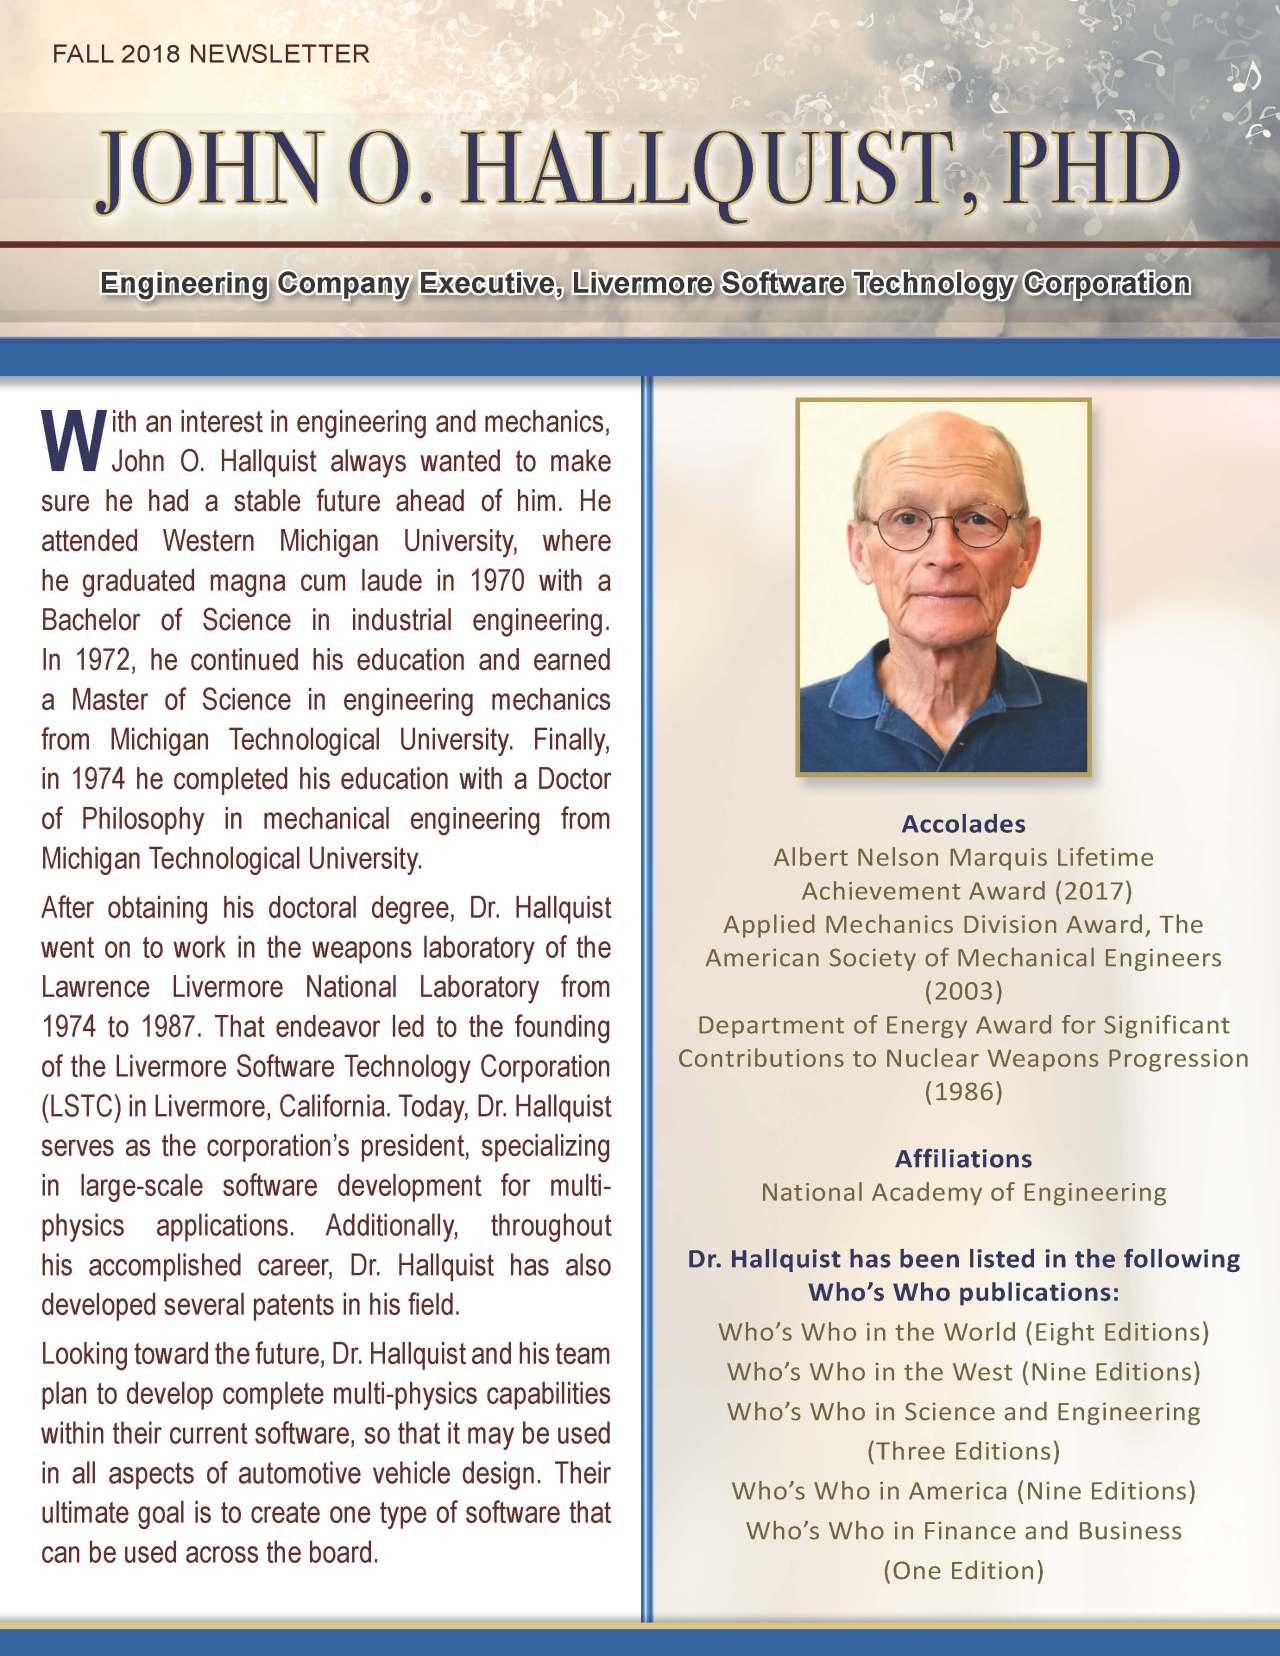 Hallquist, John 3630021_32894121 Newsletter.jpg